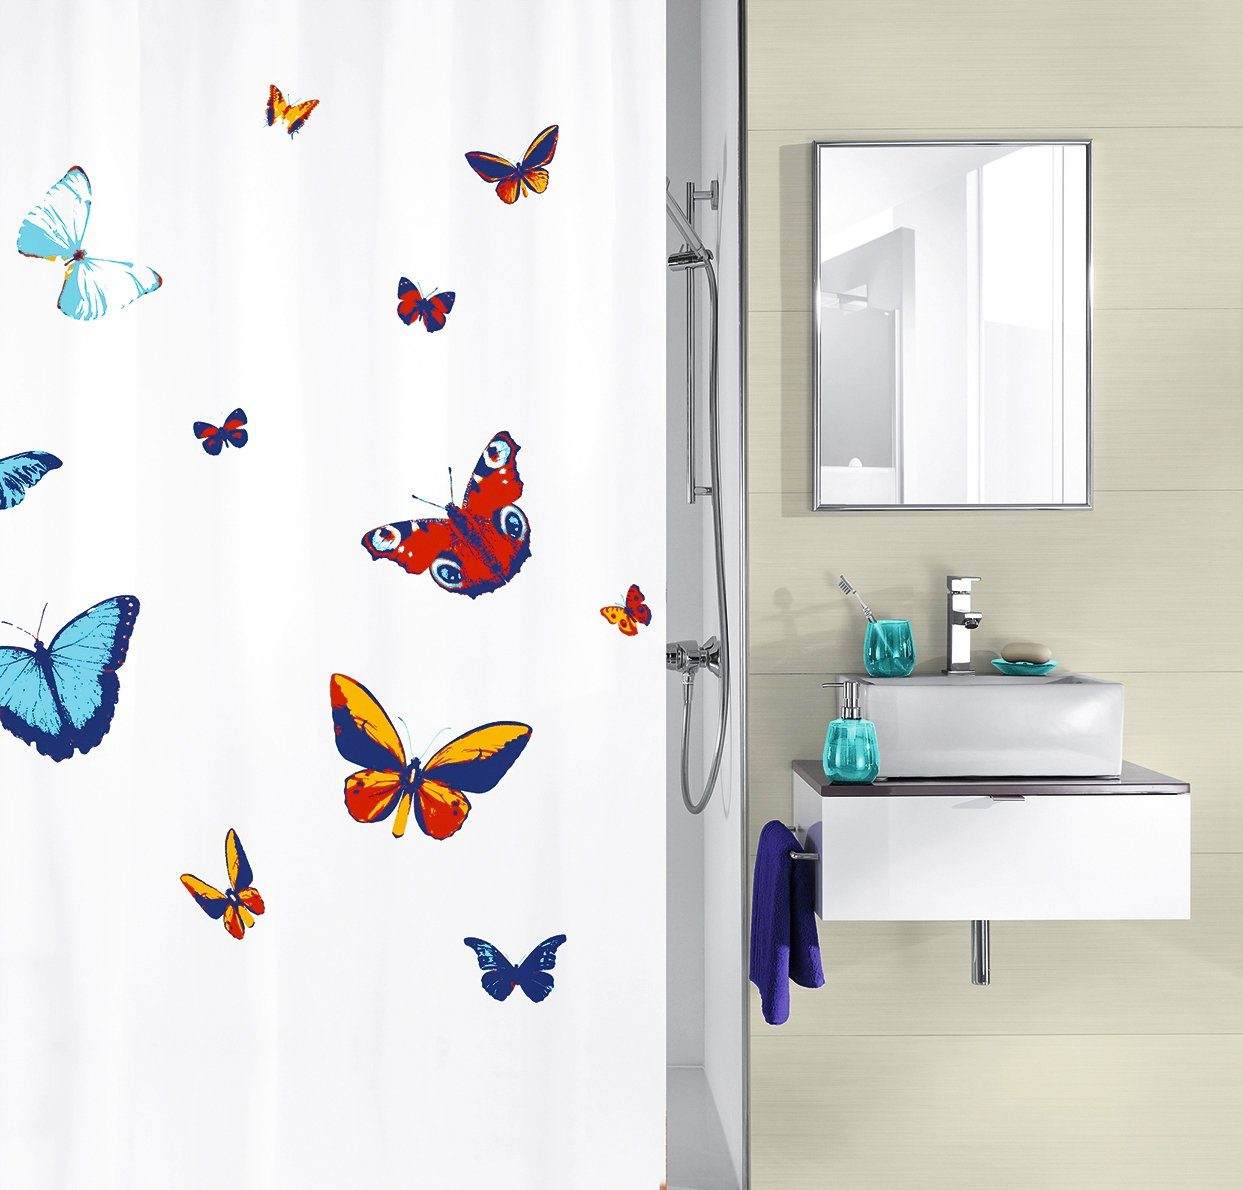 Duschvorhang Vorhang Dusche Peva Schmetterlinge beige ohne Befestigungen 7240153